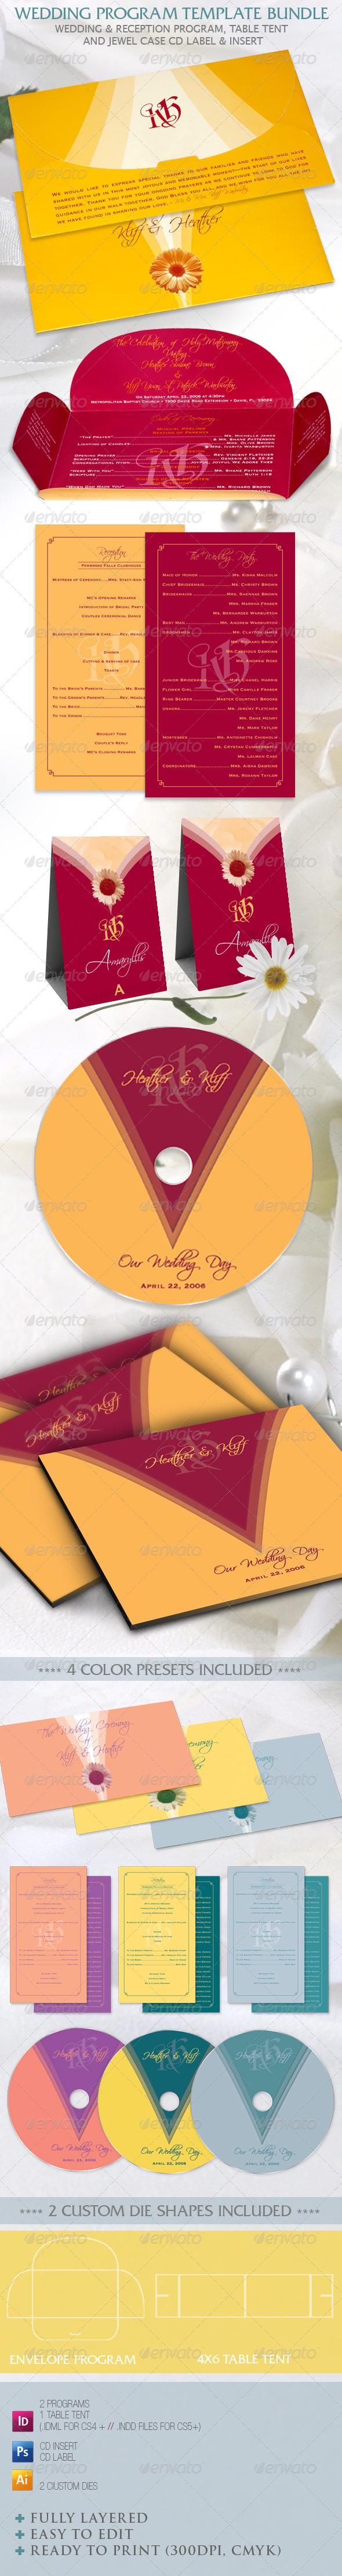 Wedding Program Template Bundle - Weddings Cards & Invites